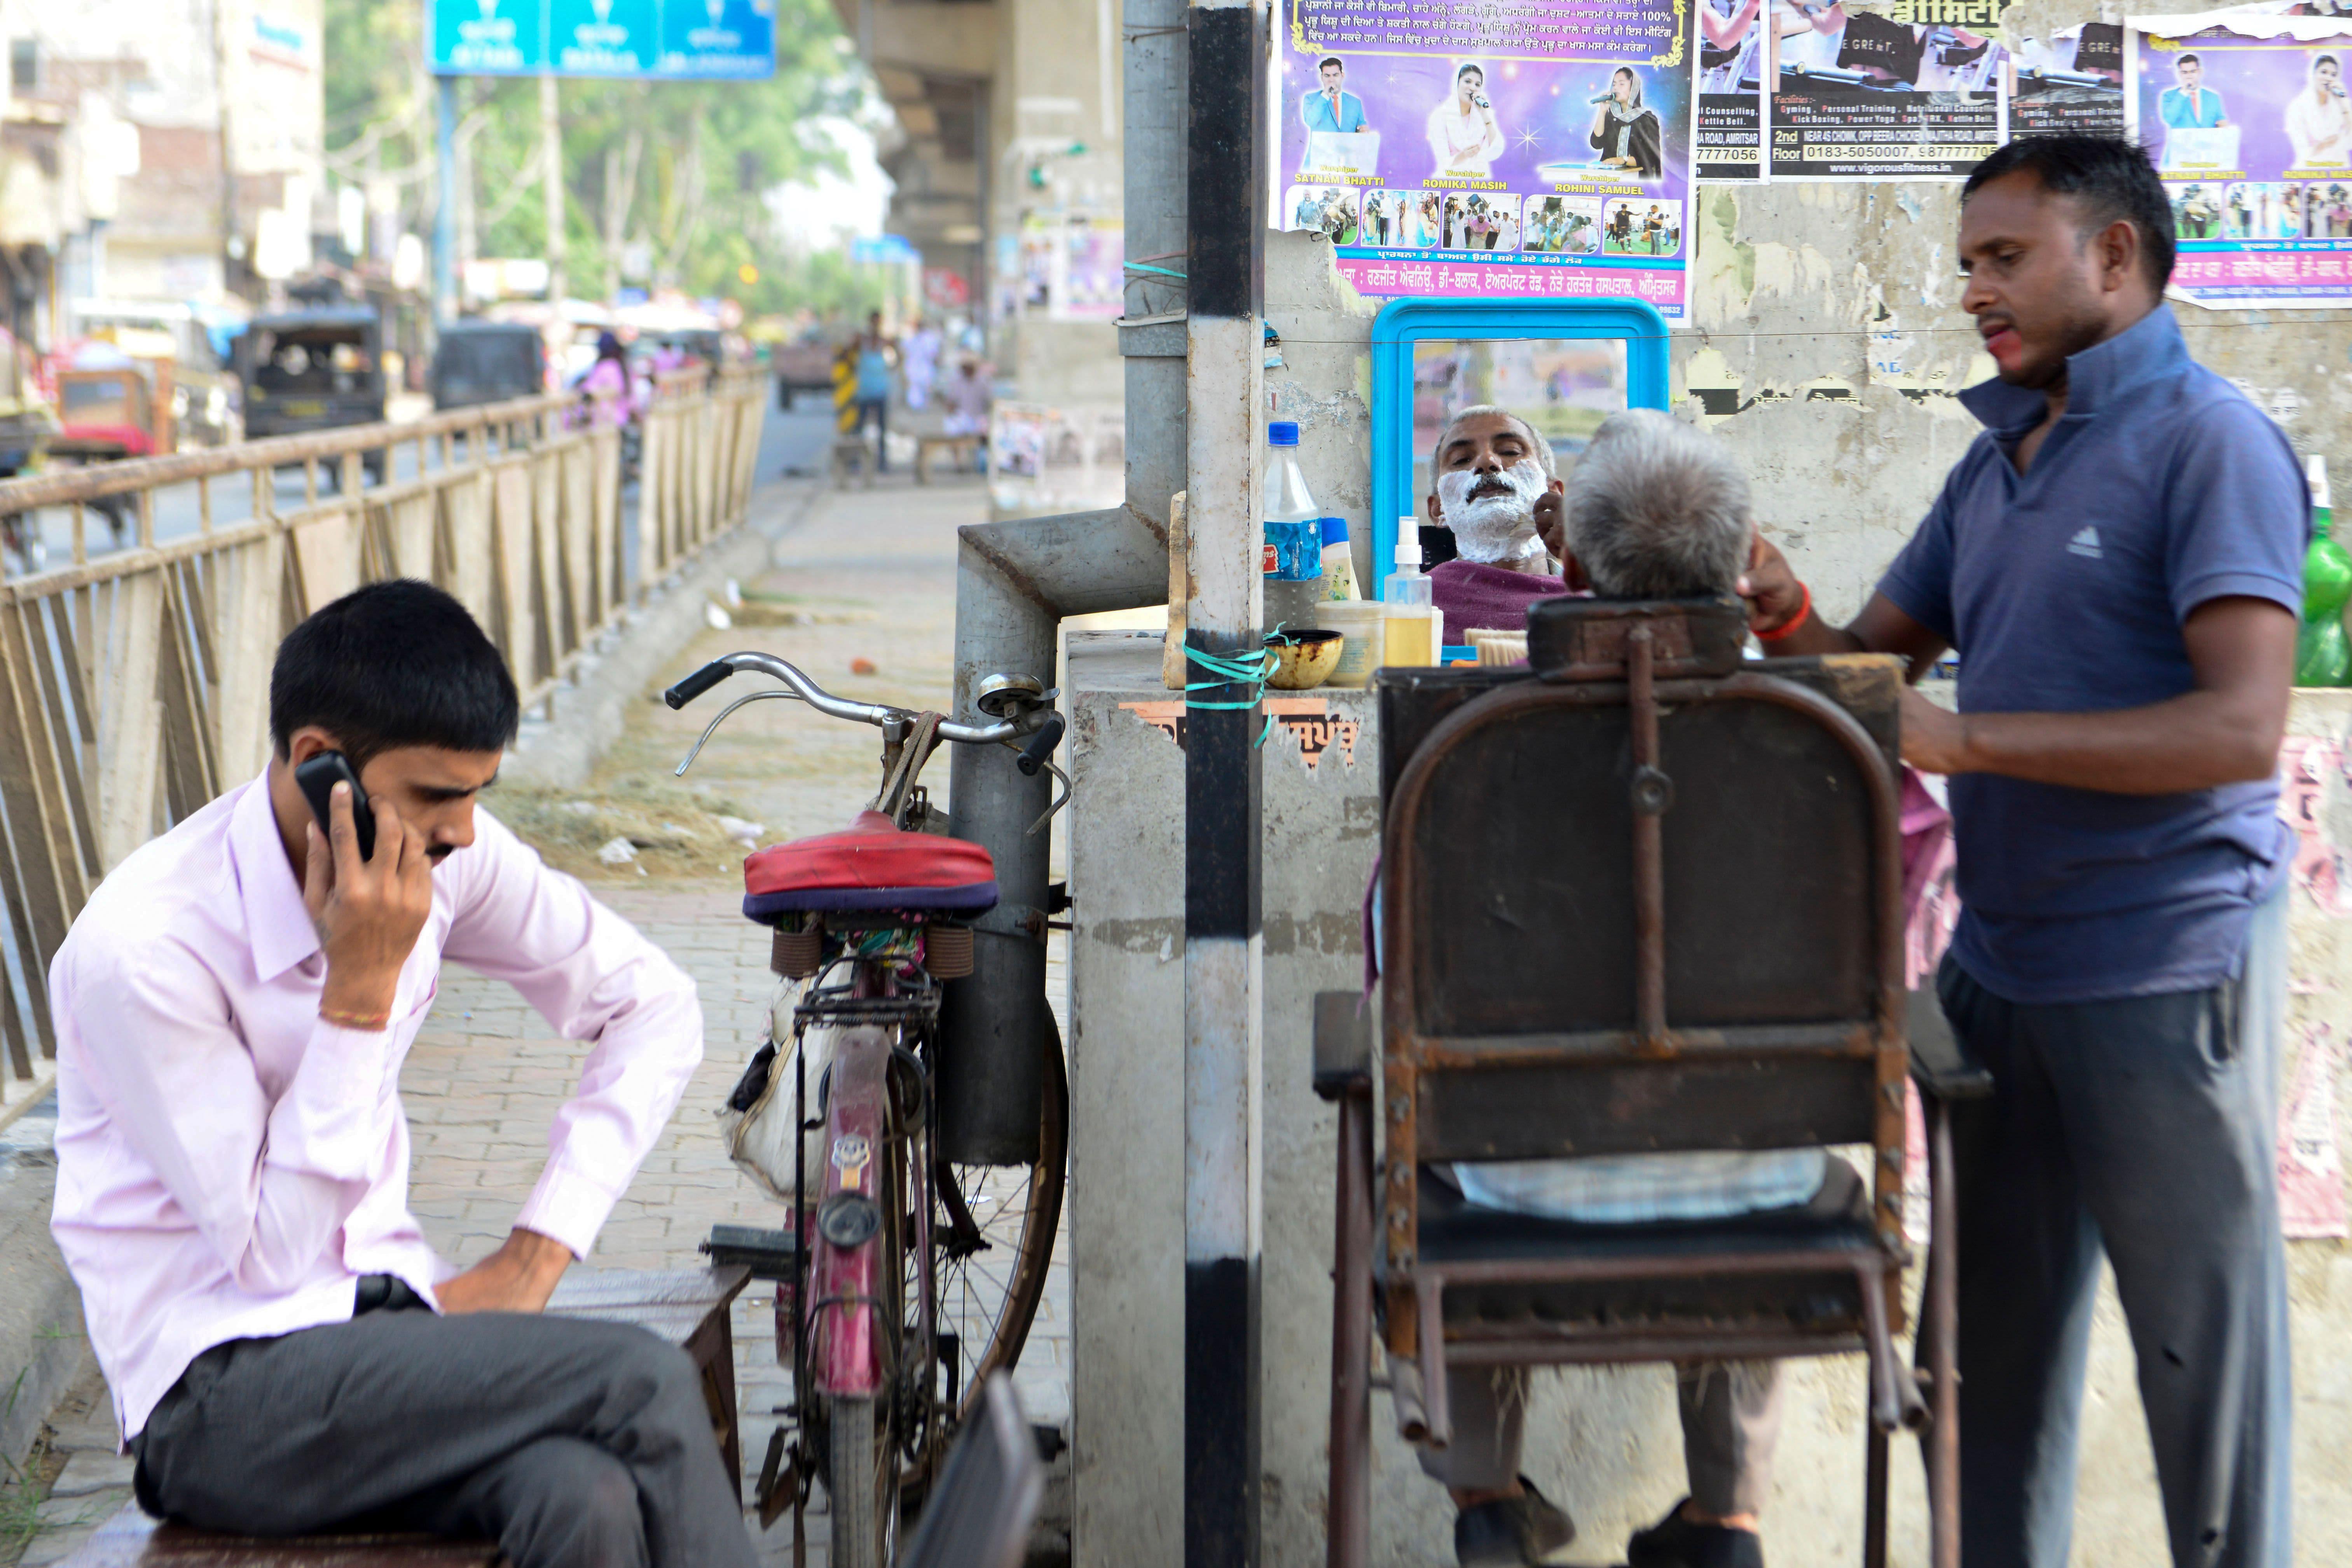 India's surprise tax cut spurs questions about offsetting lost revenue, economic impact